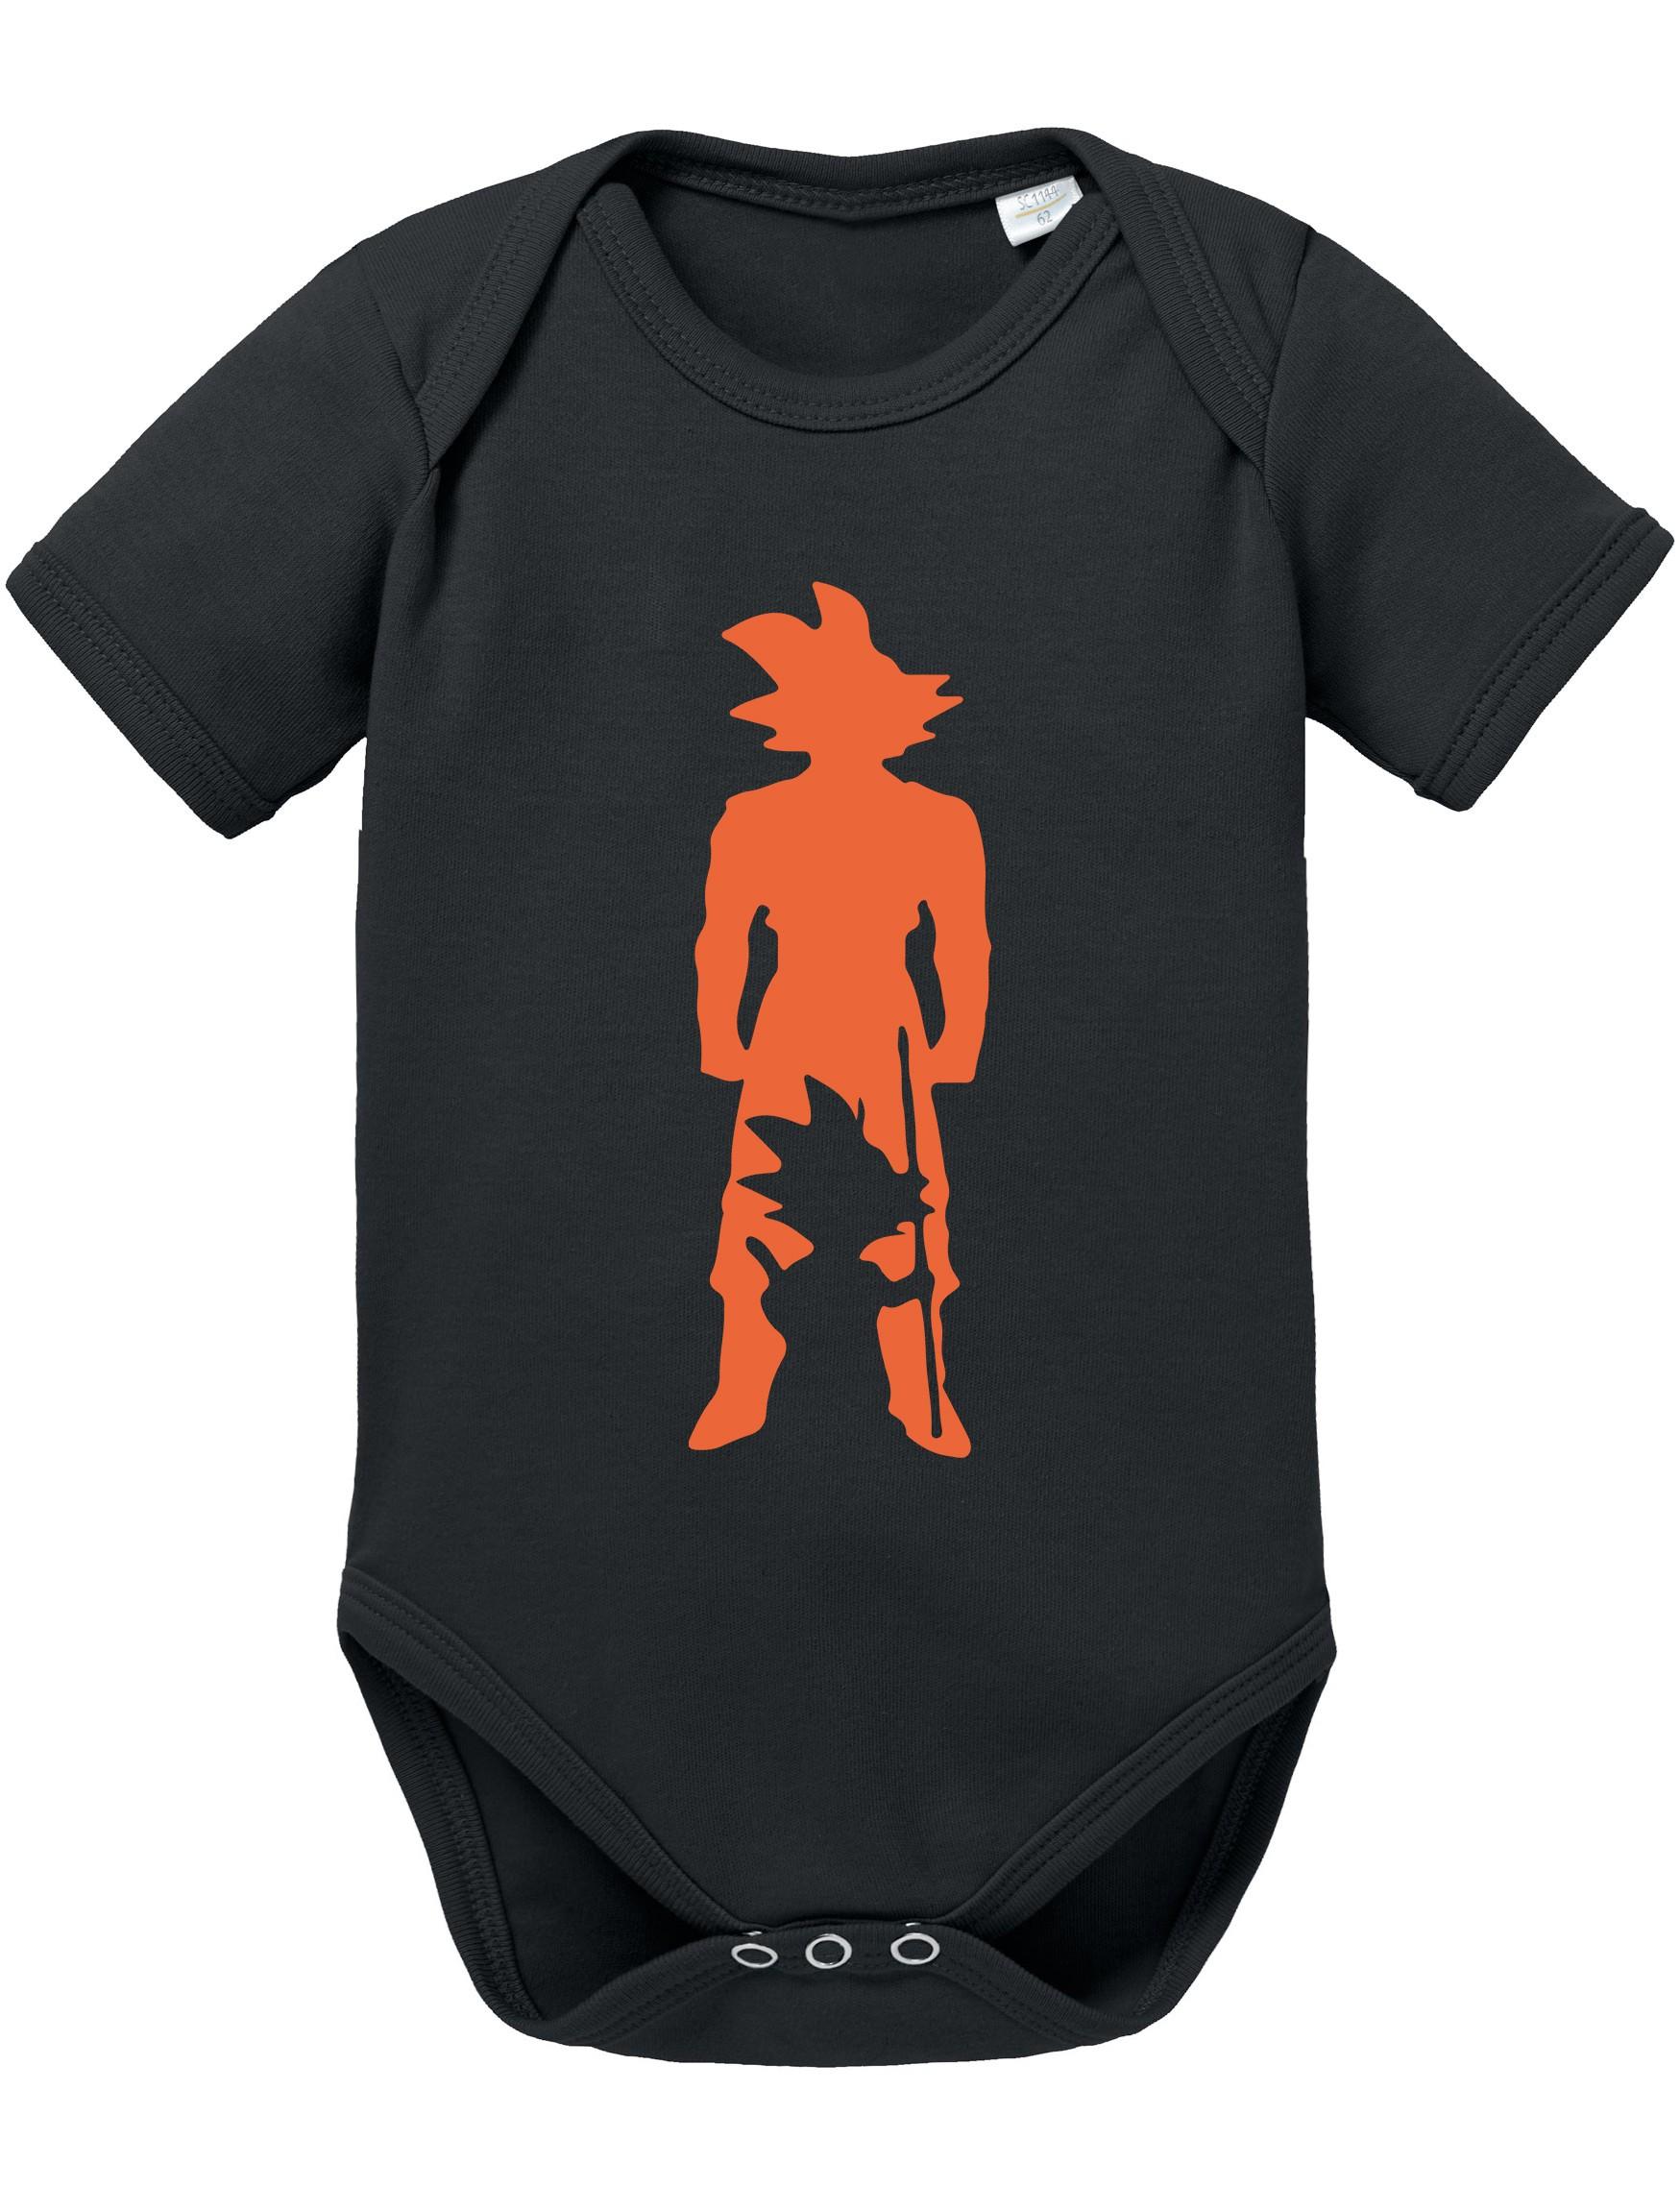 konkurrenzfähiger Preis 5c00e 40f0b Son Goku in Son Goku Baby Strampler Body